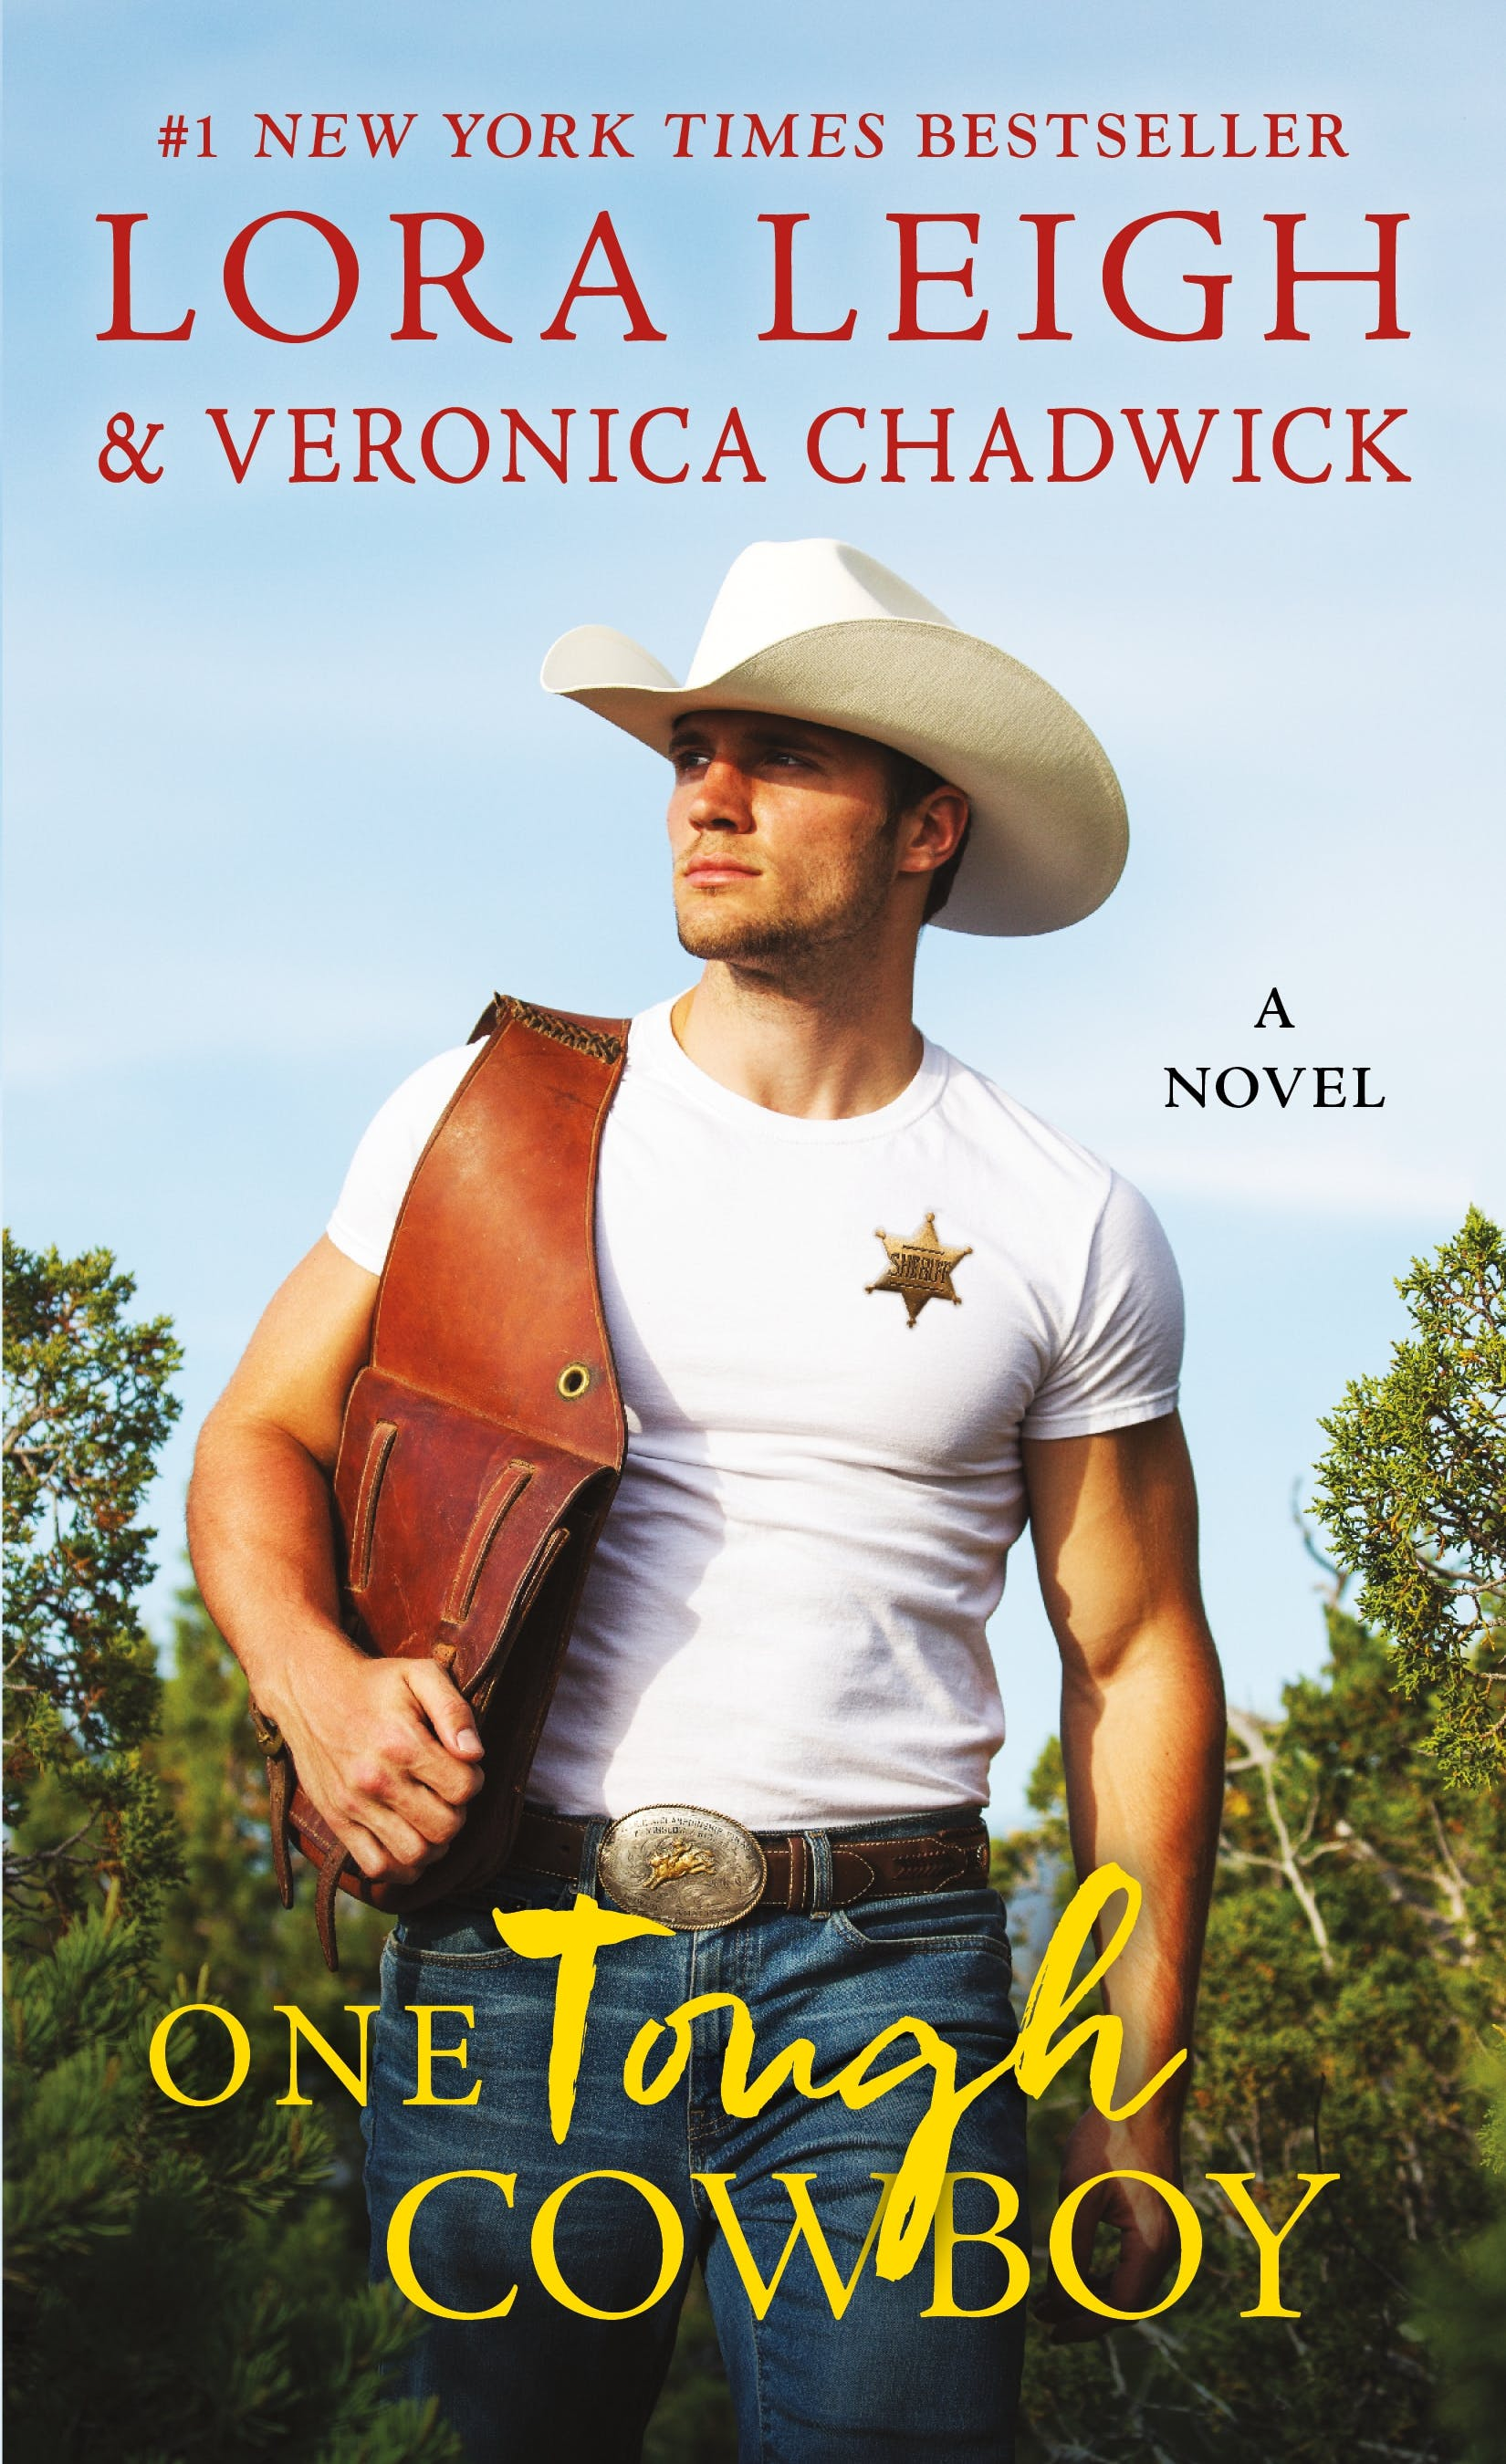 Image of One Tough Cowboy